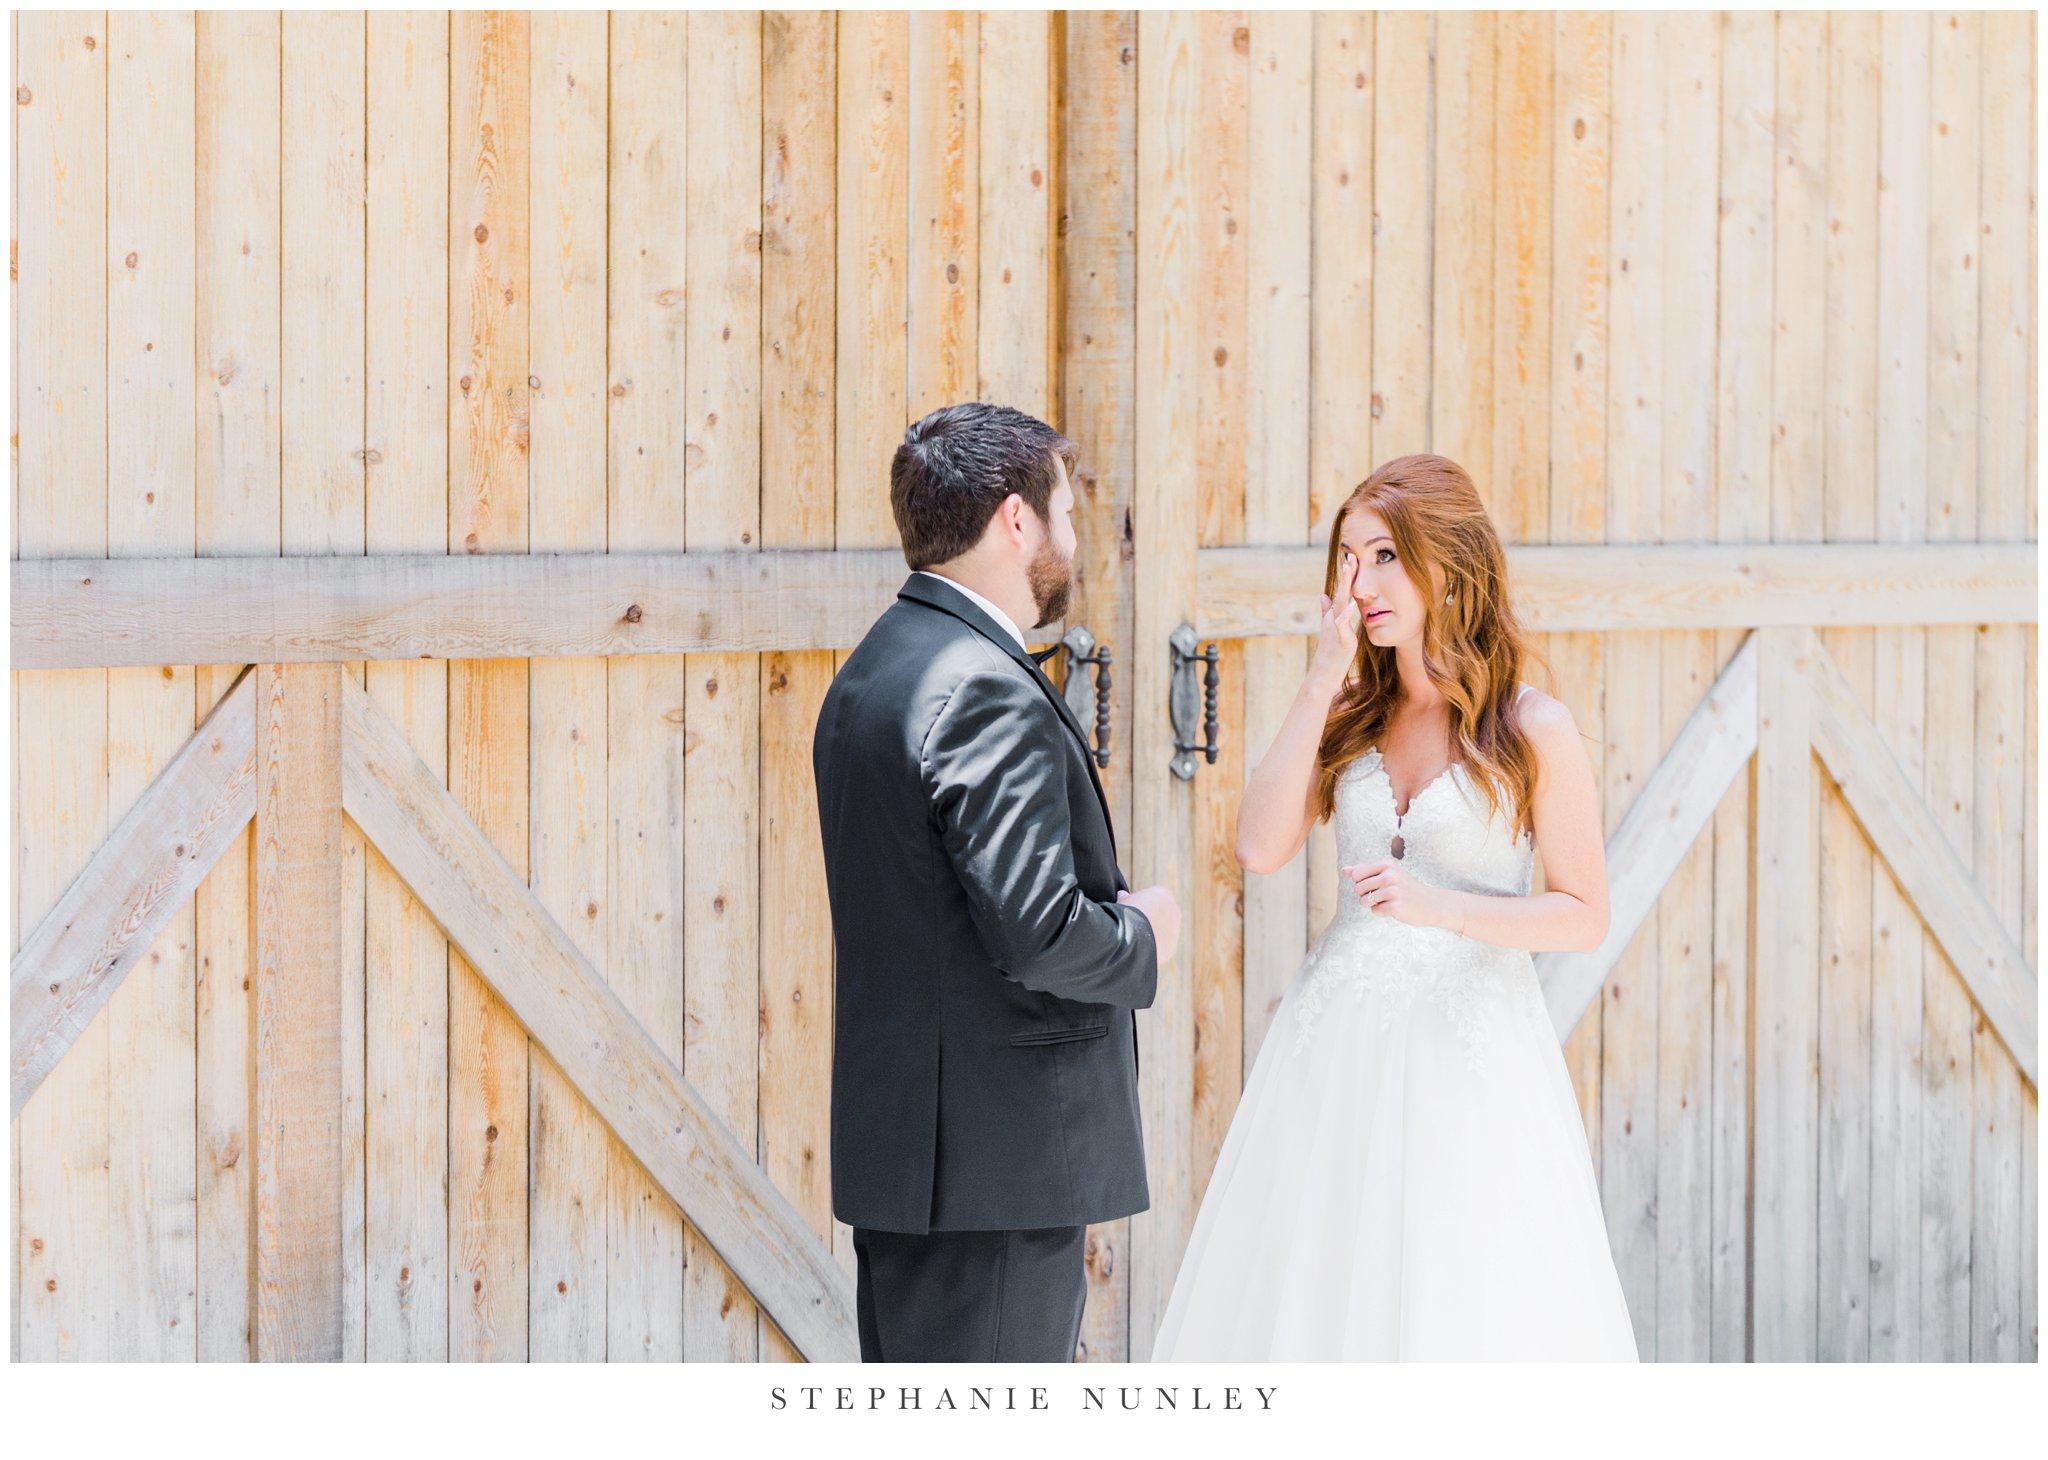 blessing-tree-farm-arkansas-wedding-0026.jpg